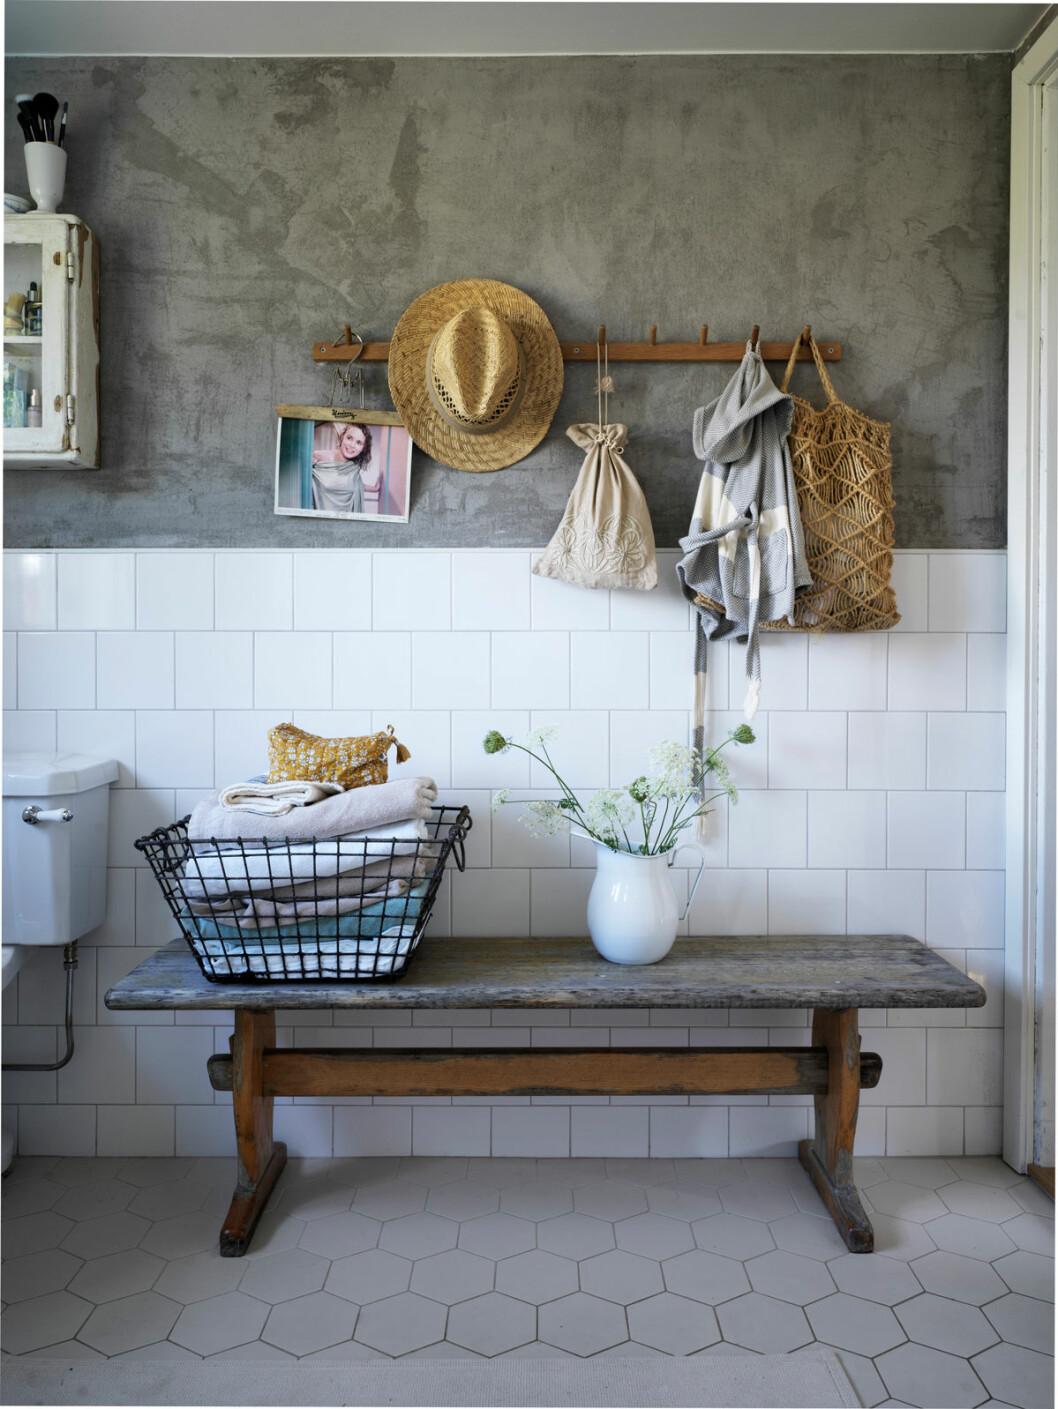 xElsa Billgren sommarhus Gotland badrum